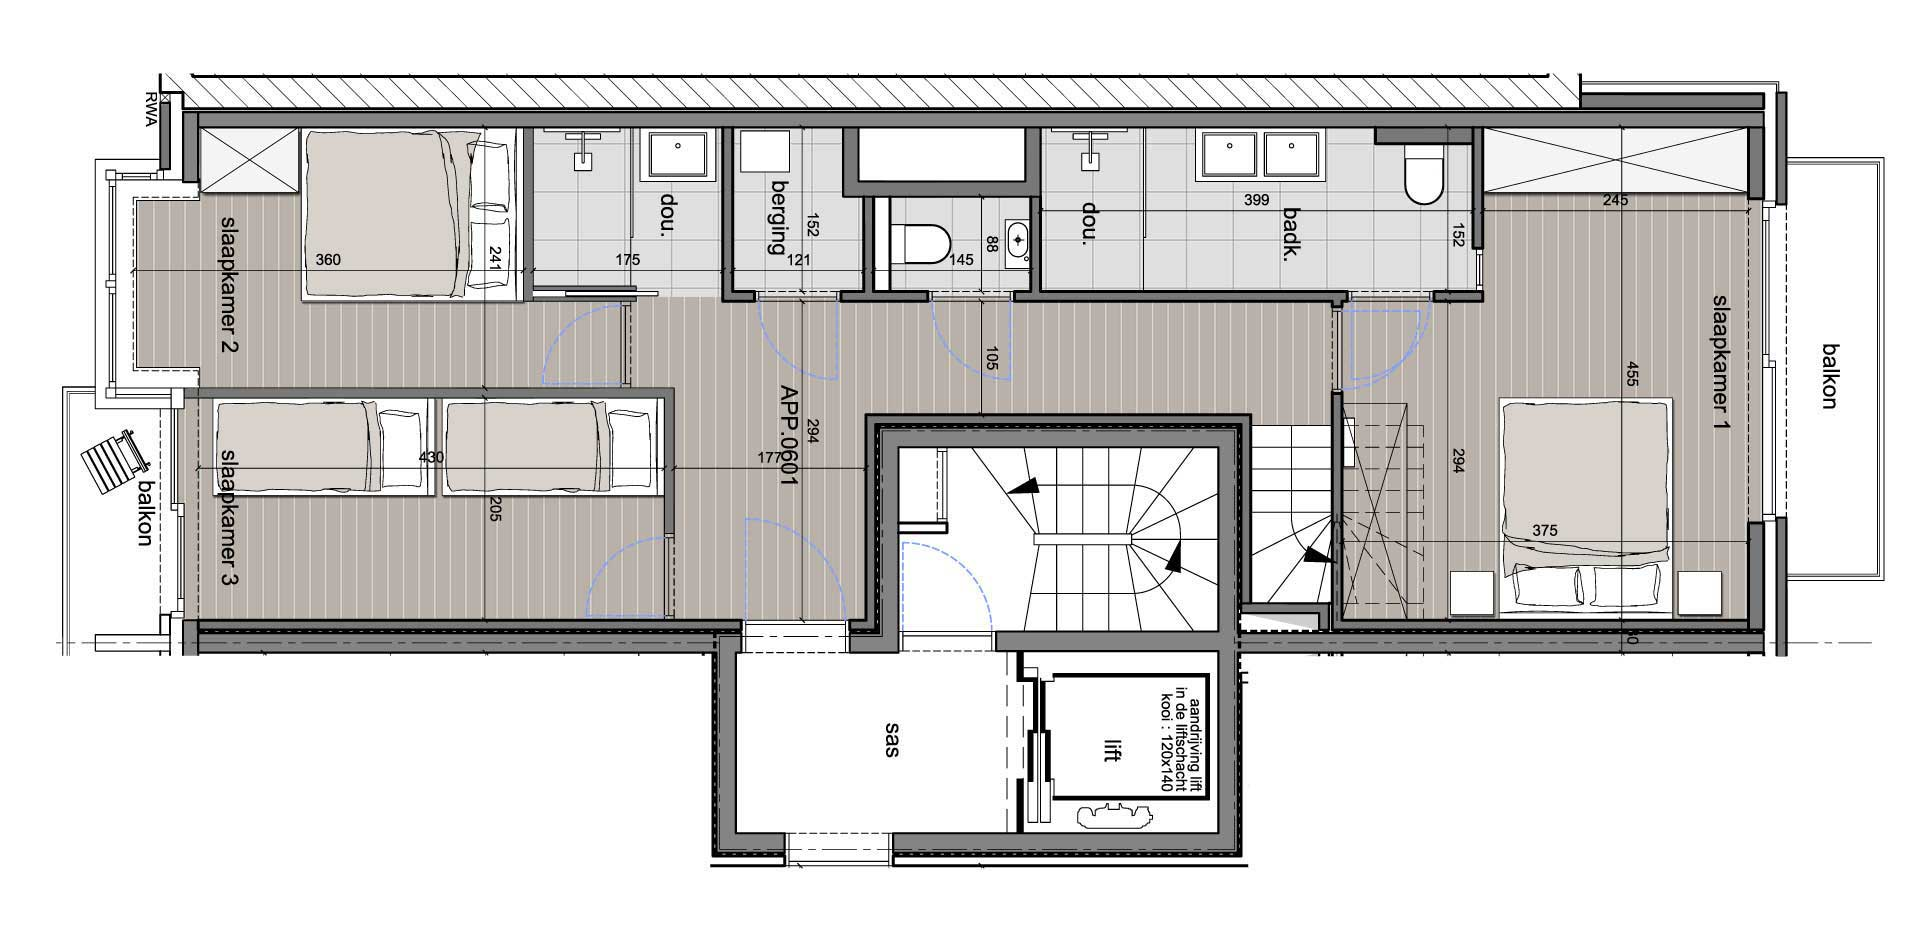 Residentie <br /> Winoc - image nieuwbouwappartement-koksijde-residentie-winoc-6.1.1 on https://hoprom.be